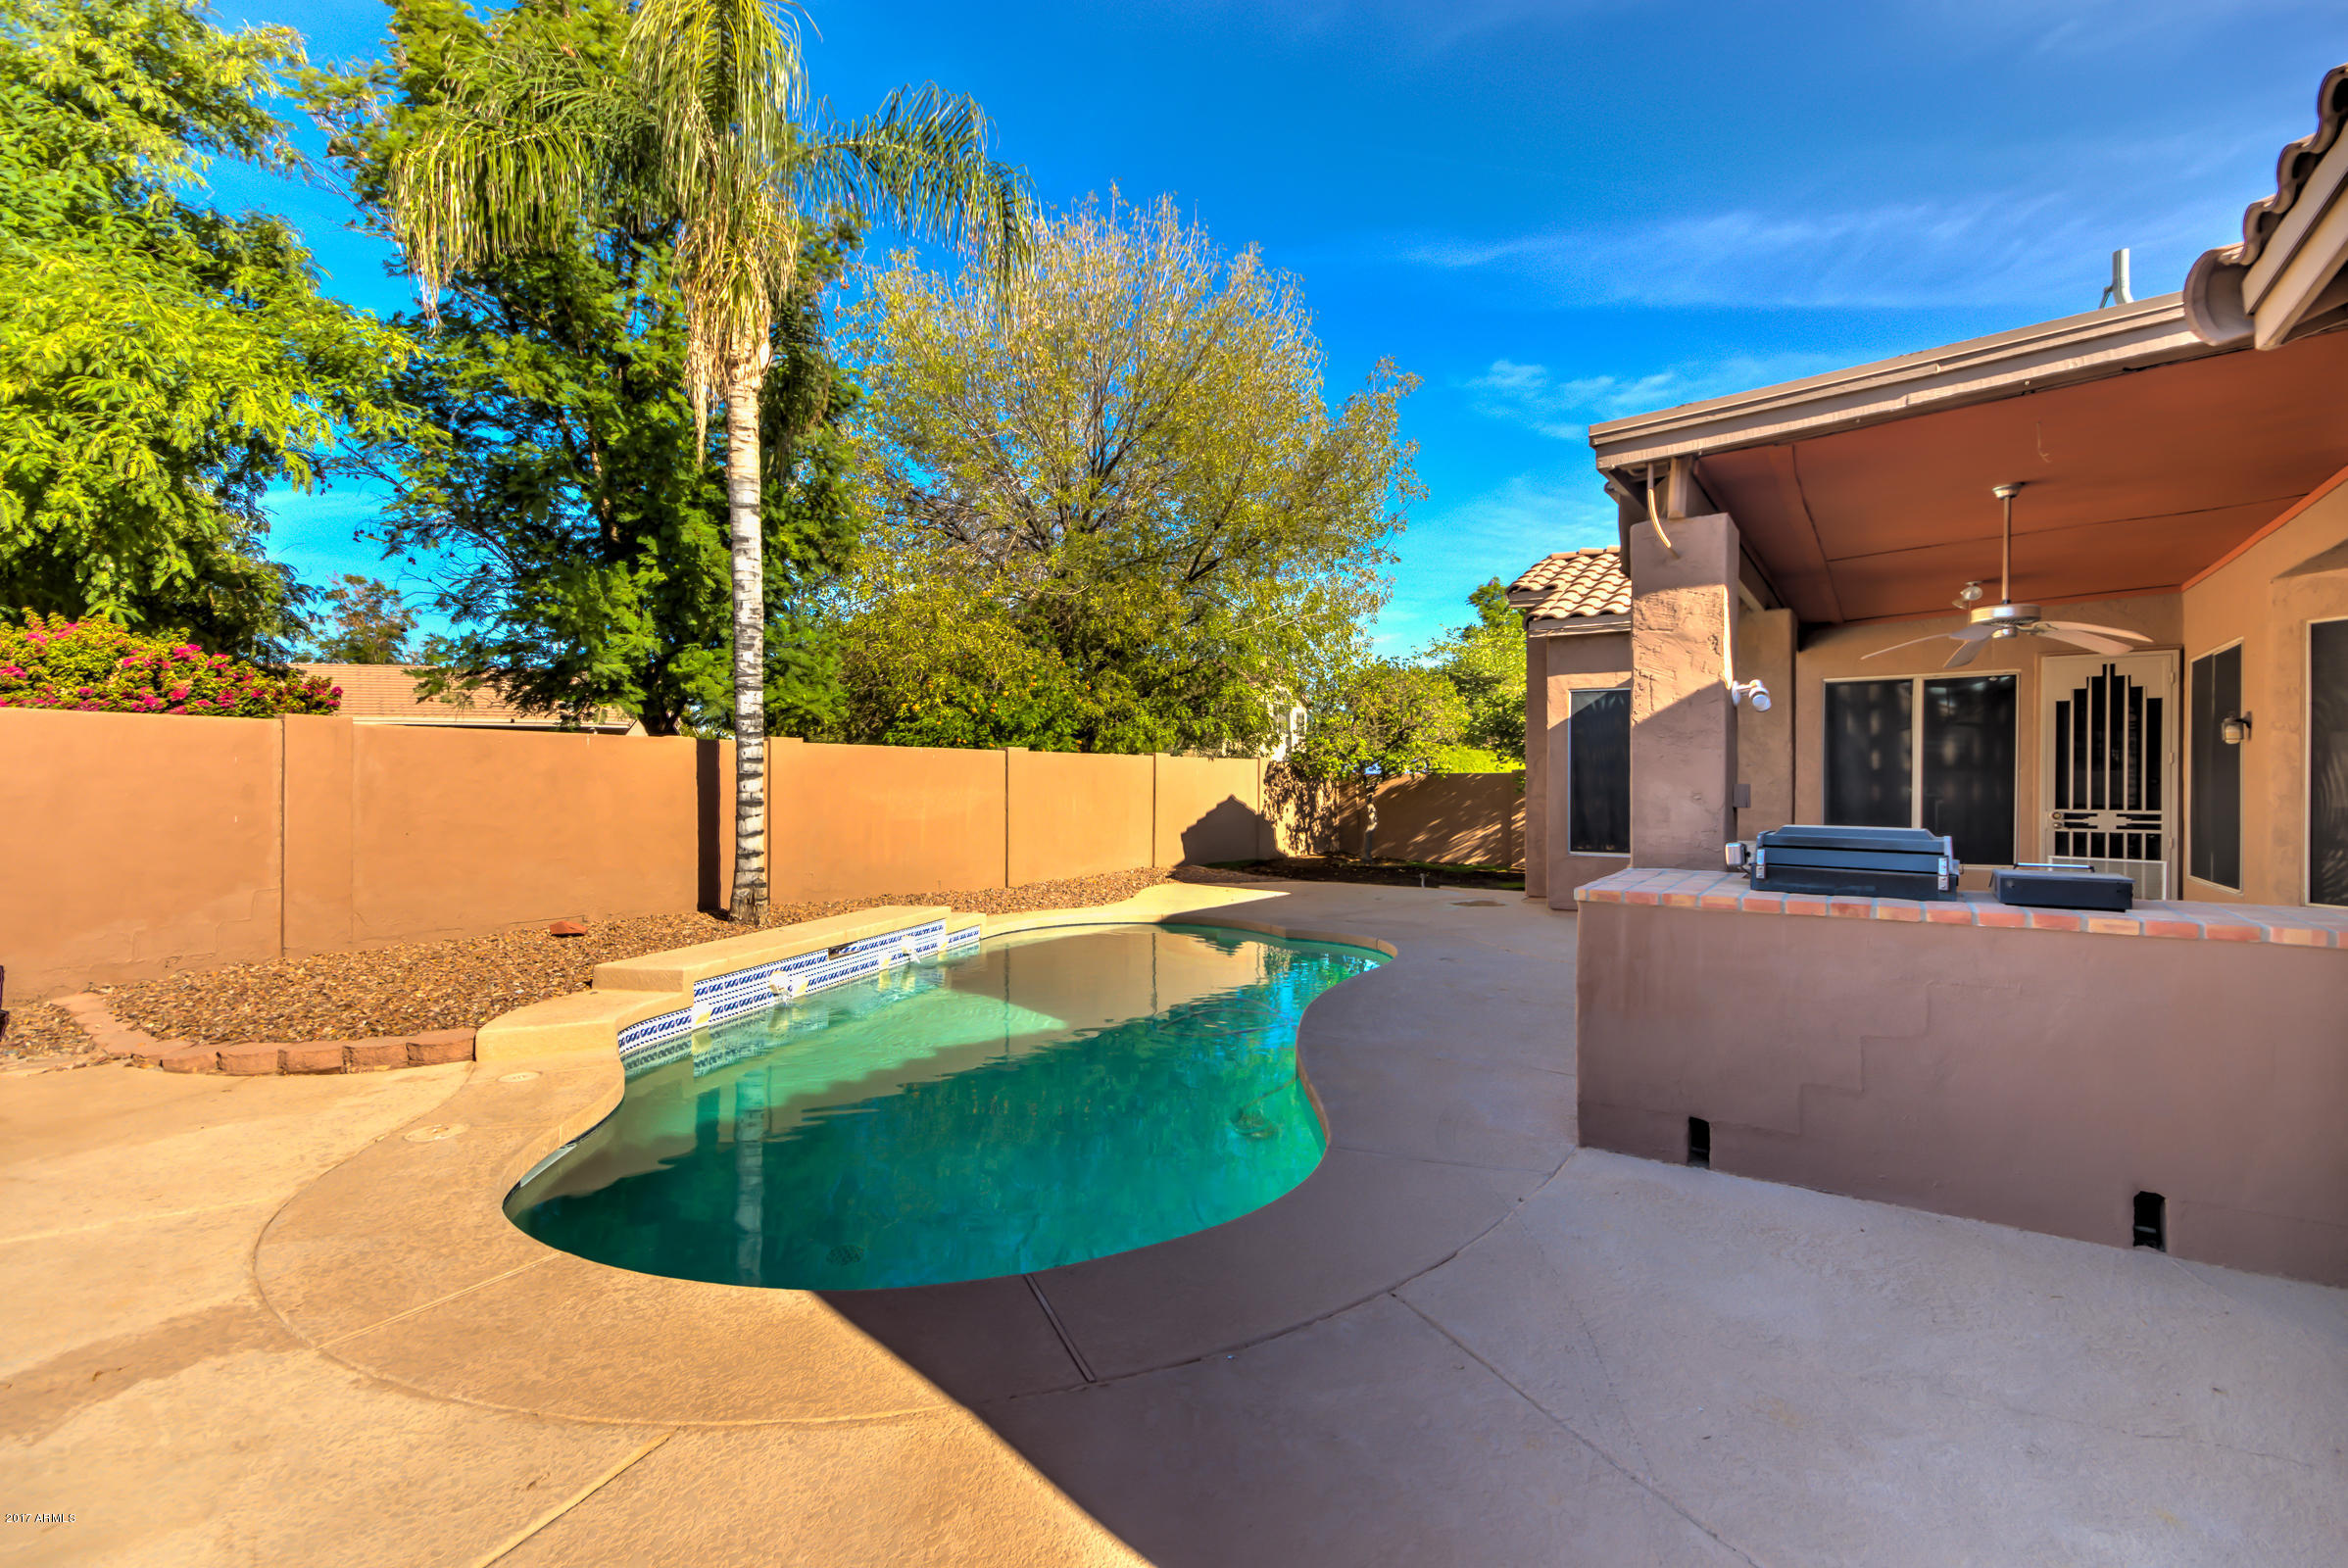 304 S Ironwood  Street Gilbert, AZ 85296 - img49